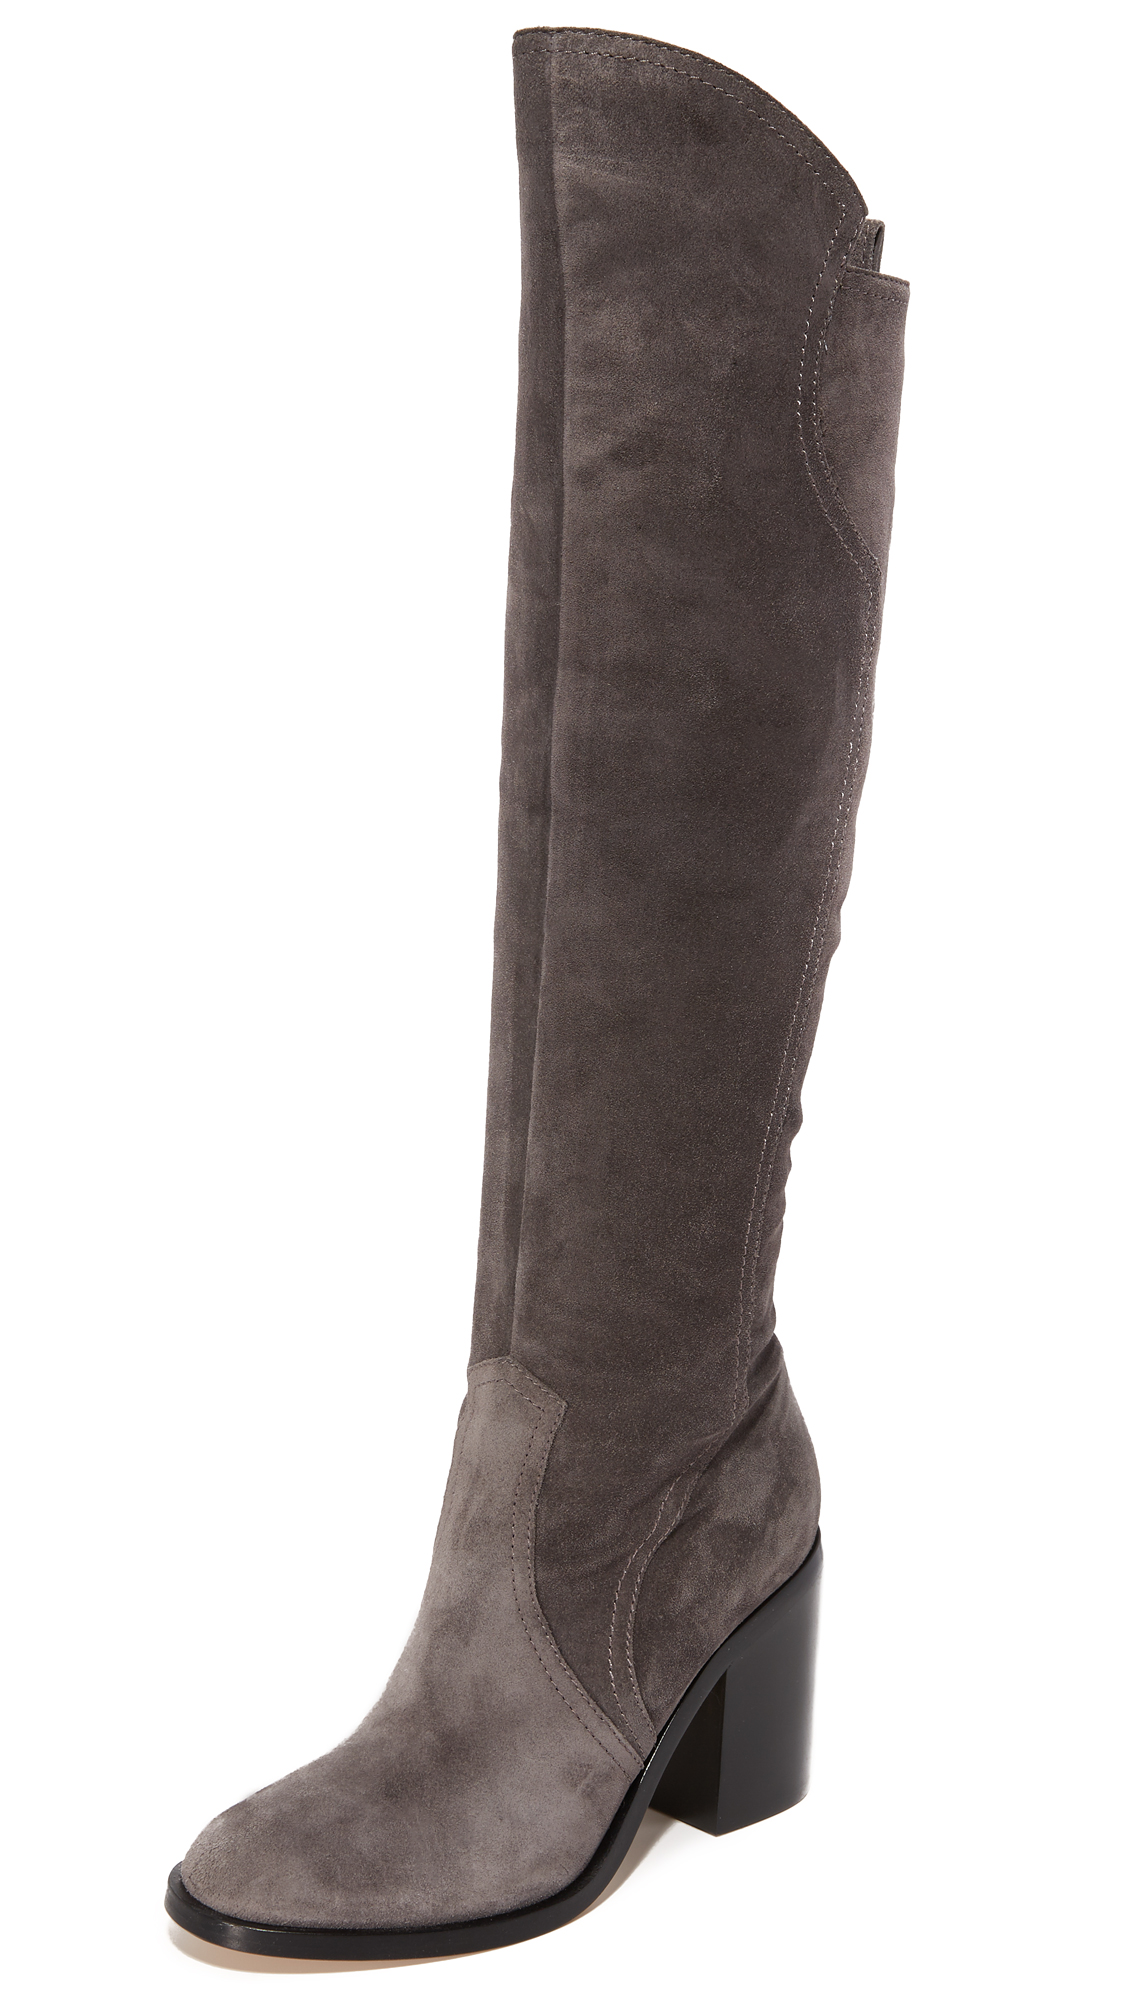 Sigerson Morrison Bambina Boots - Litio